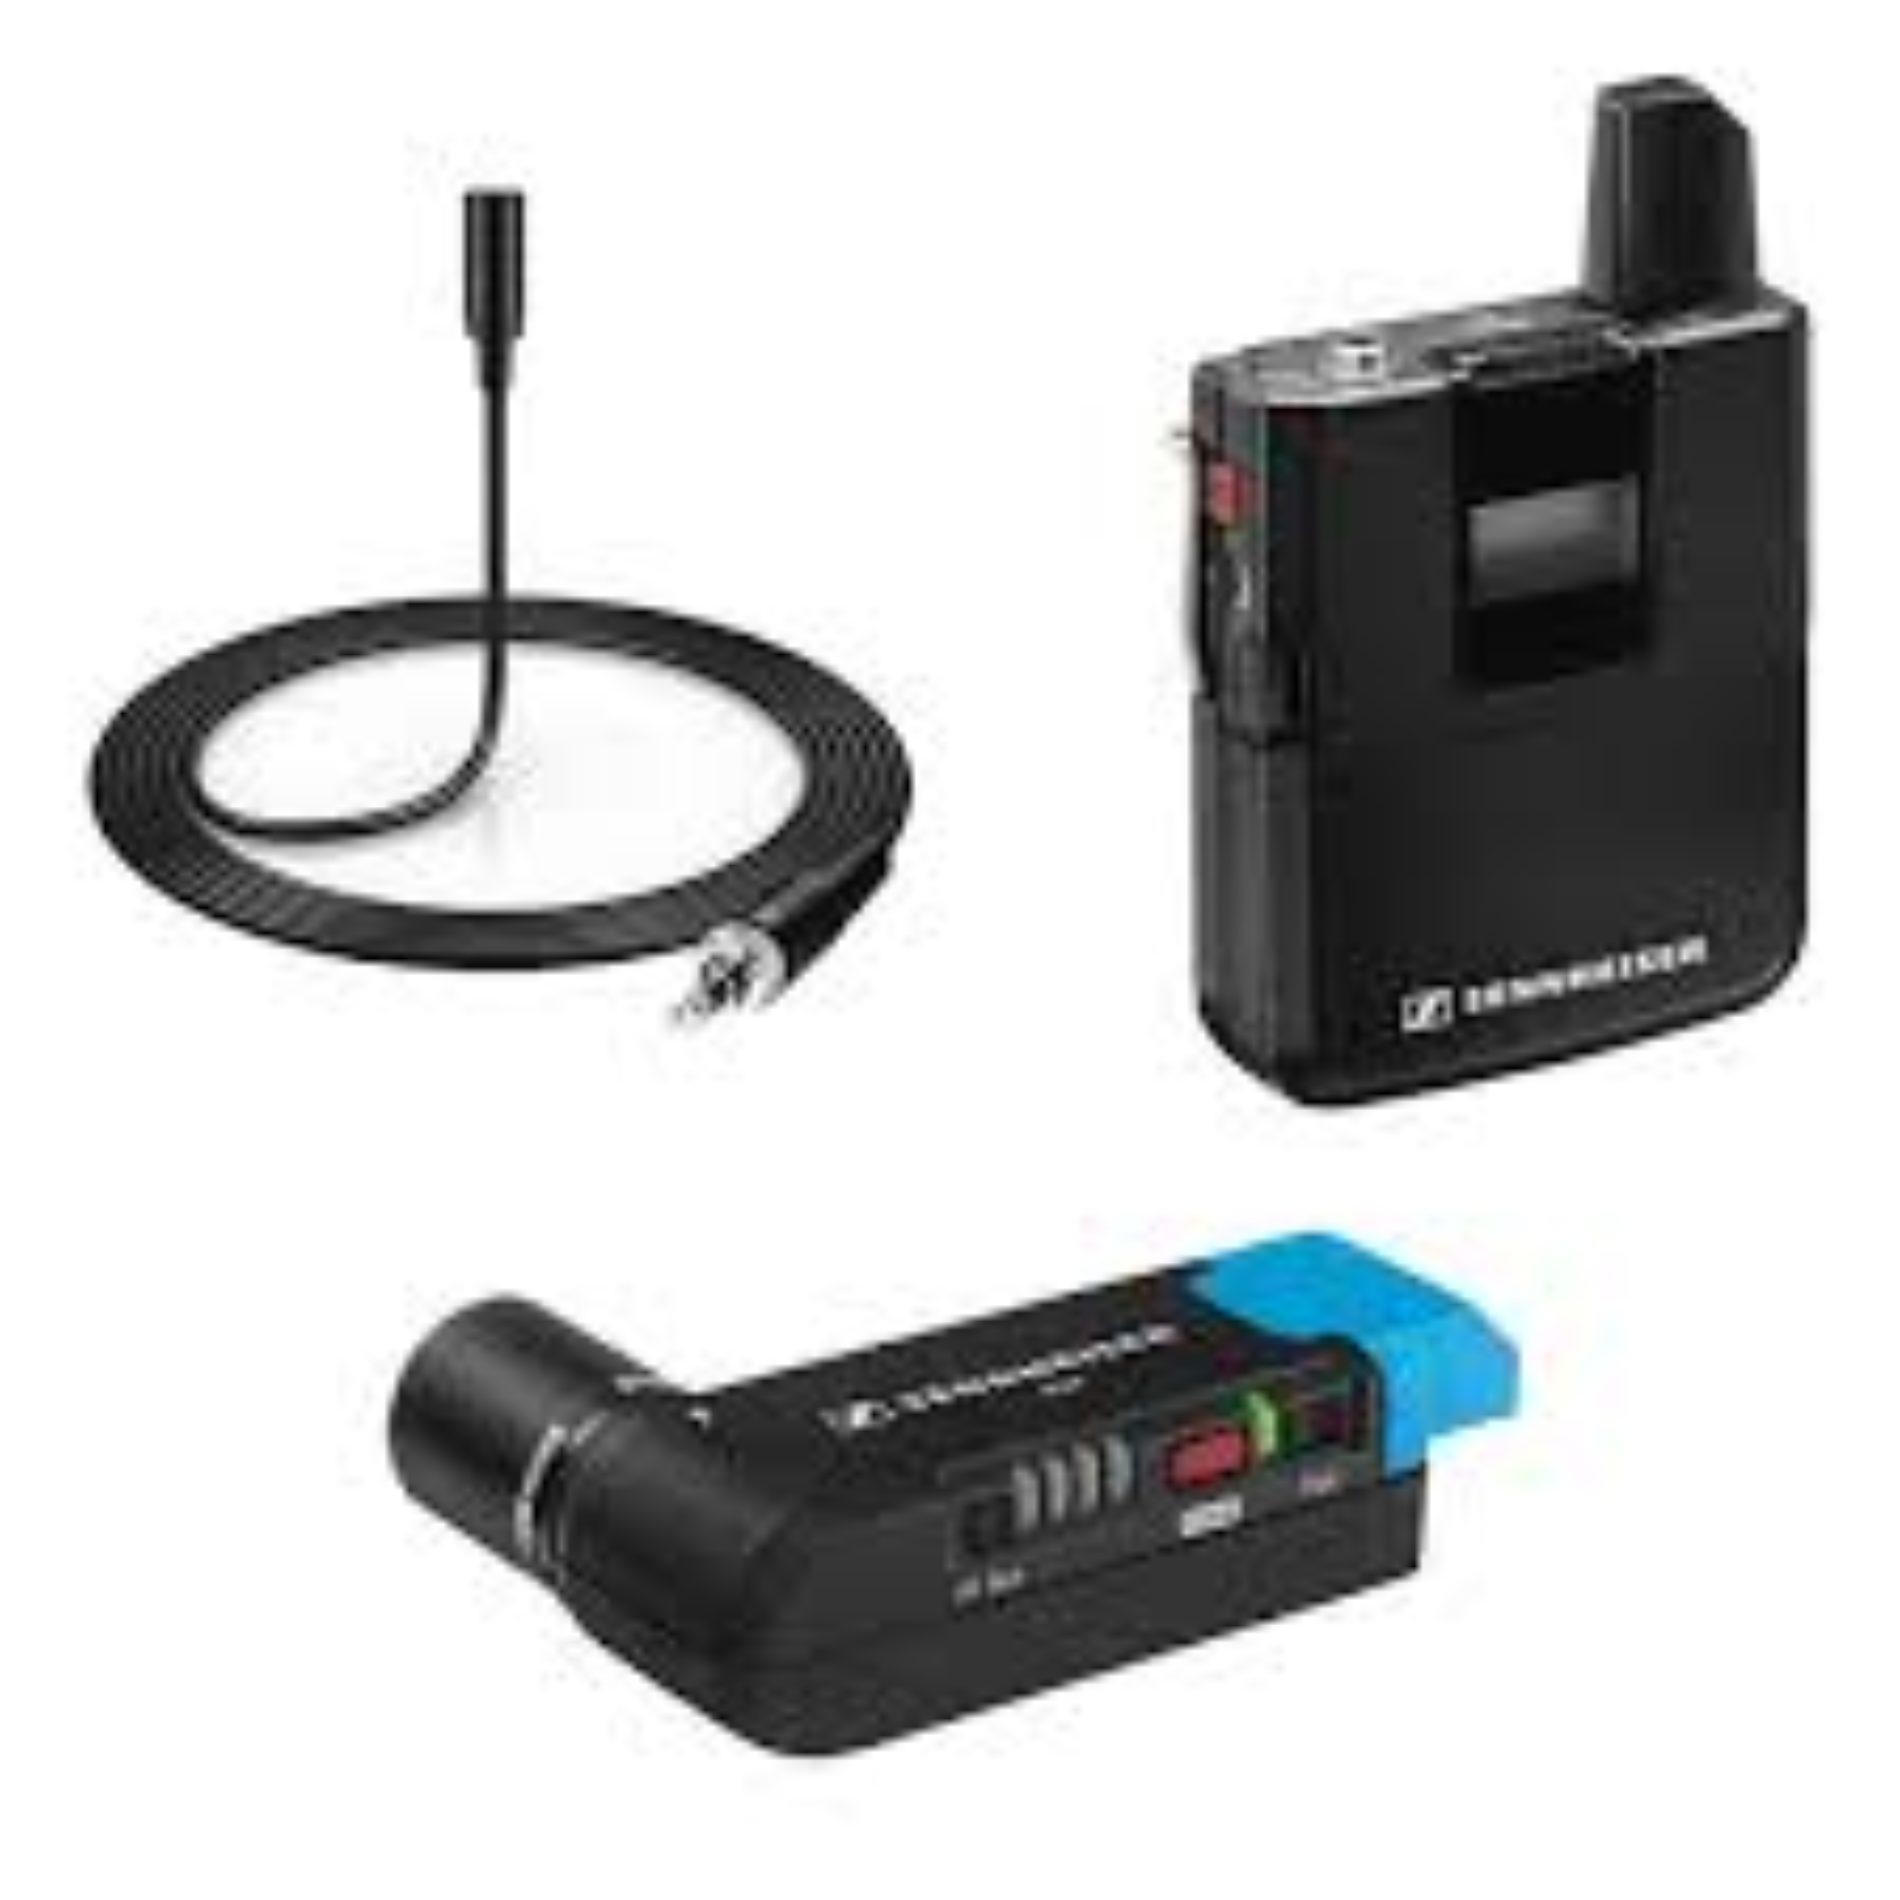 Sennheiser y su micrófono para videógrafos